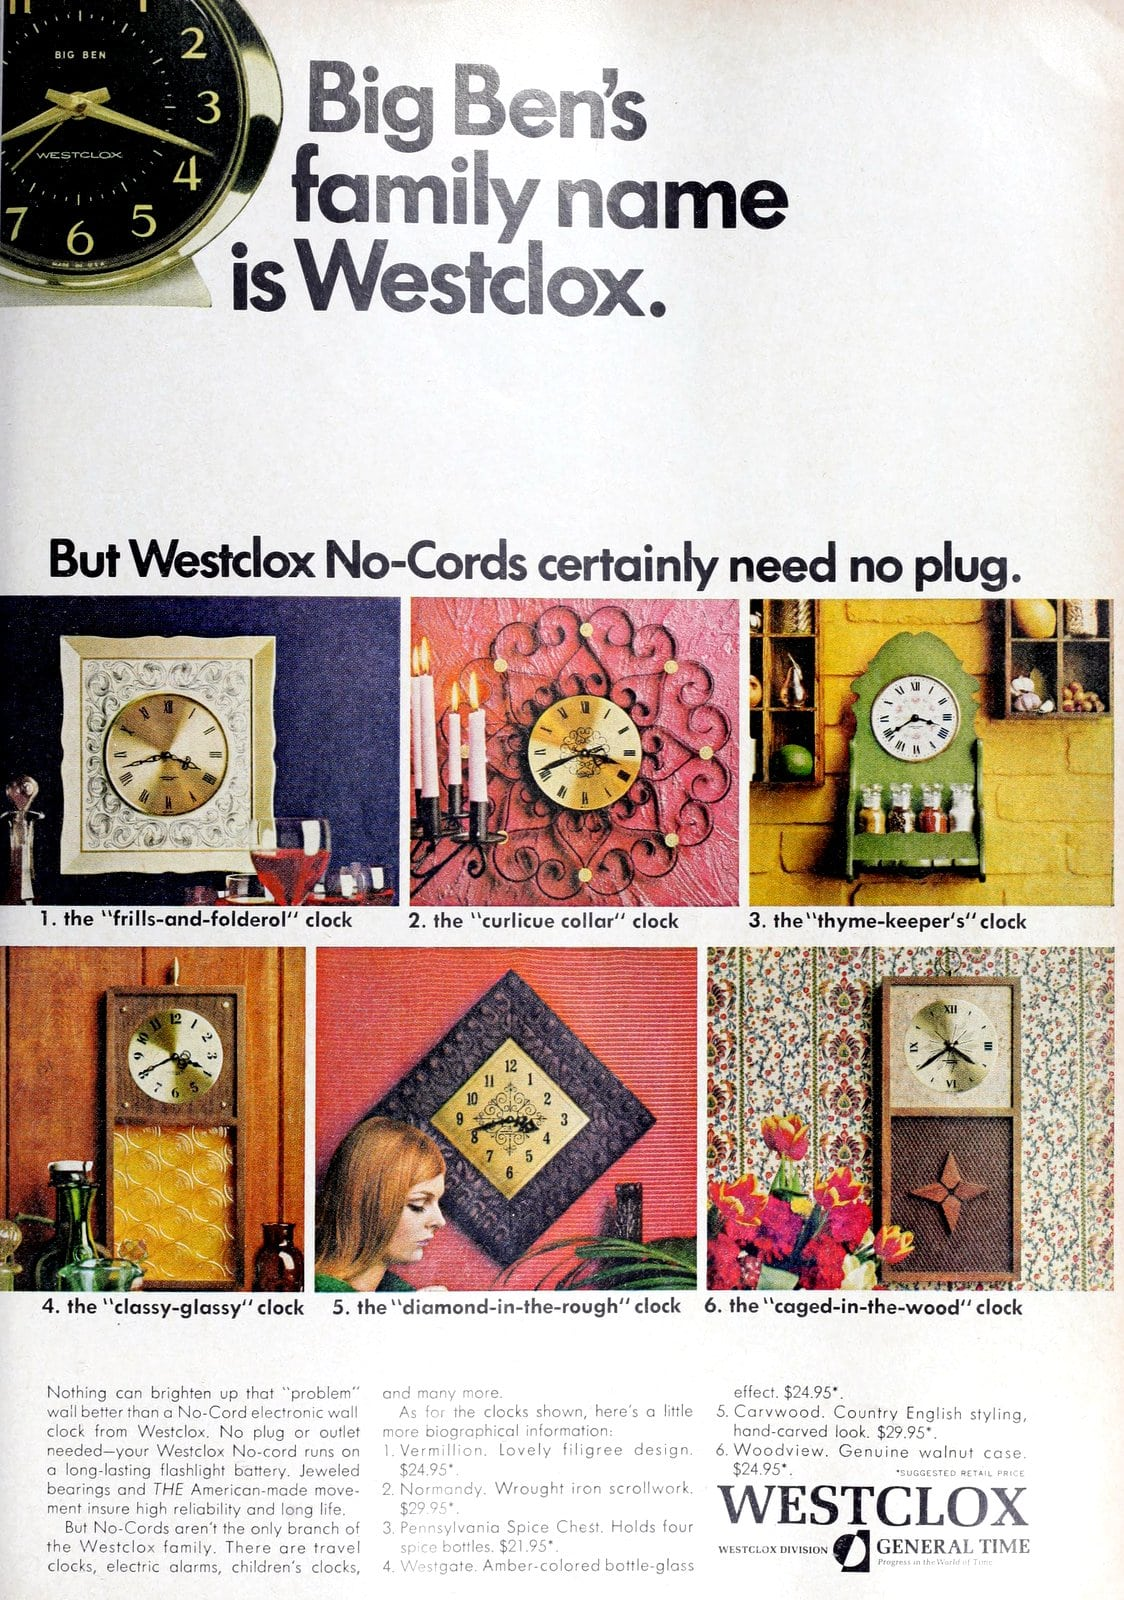 6 sixties styles of Westclox No-Cords wall clocks (1968)